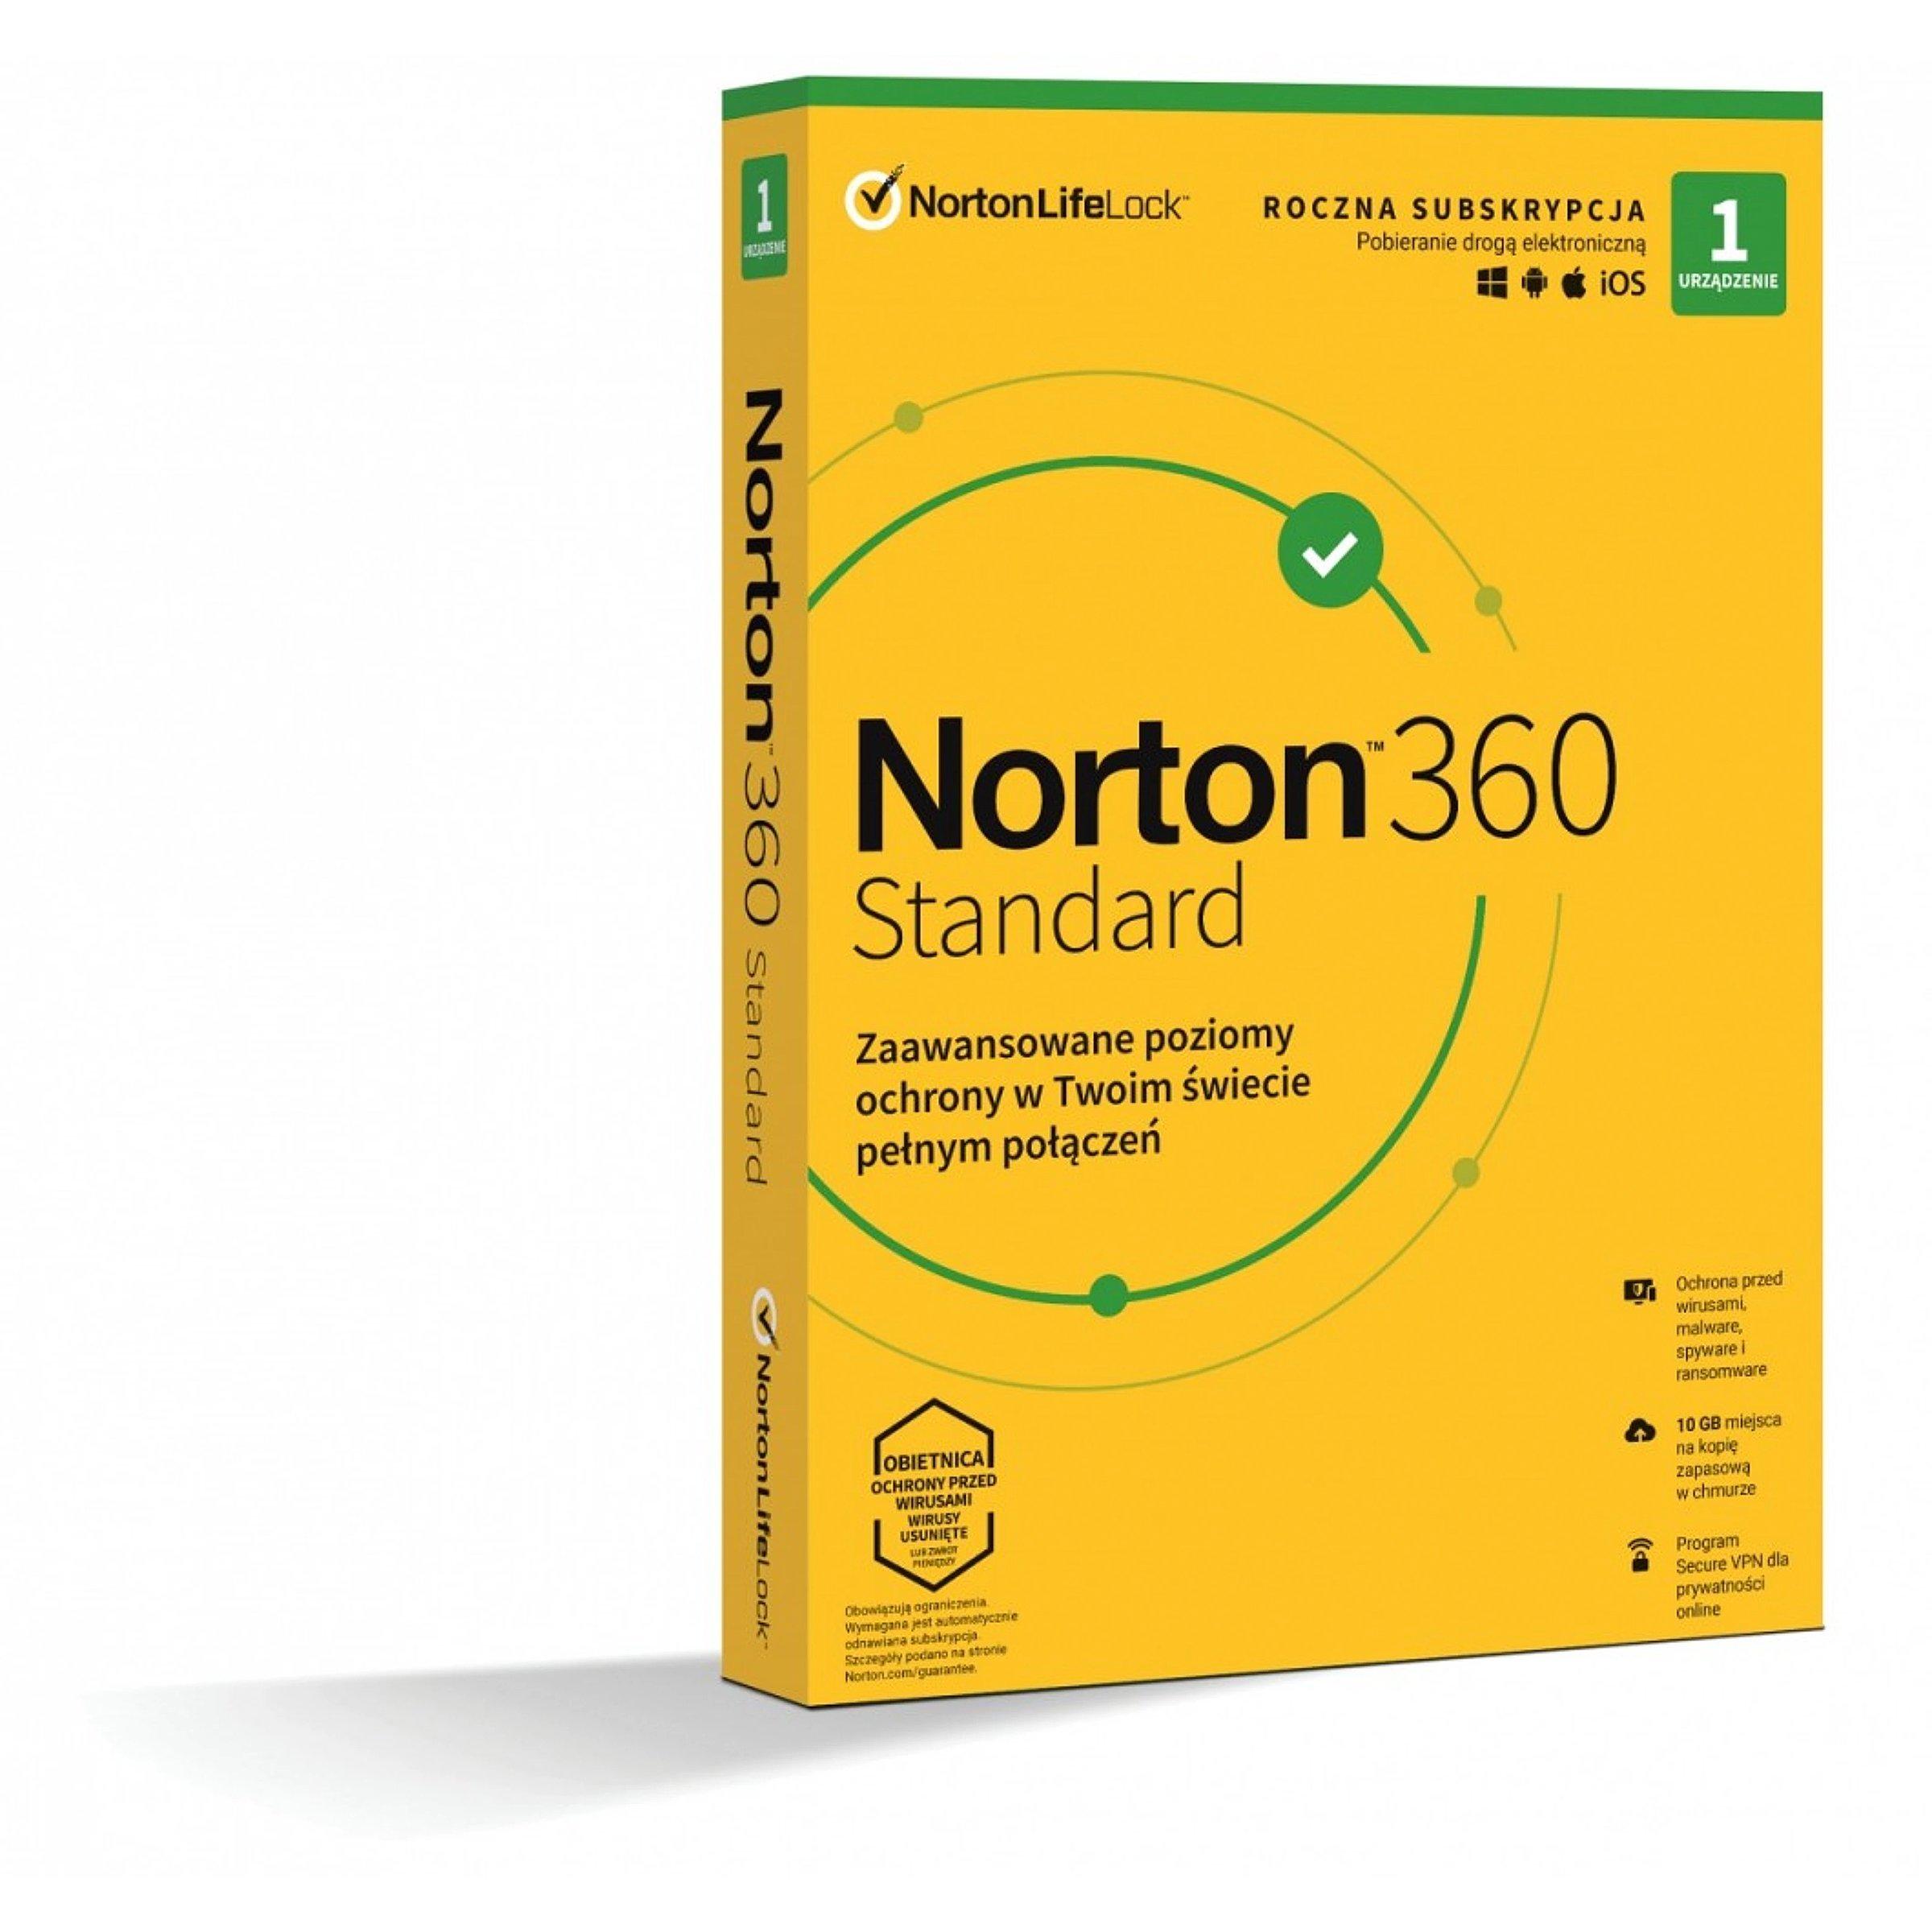 Symantec 360 Standard 10GB PL 1 user, 1 devices, 1..